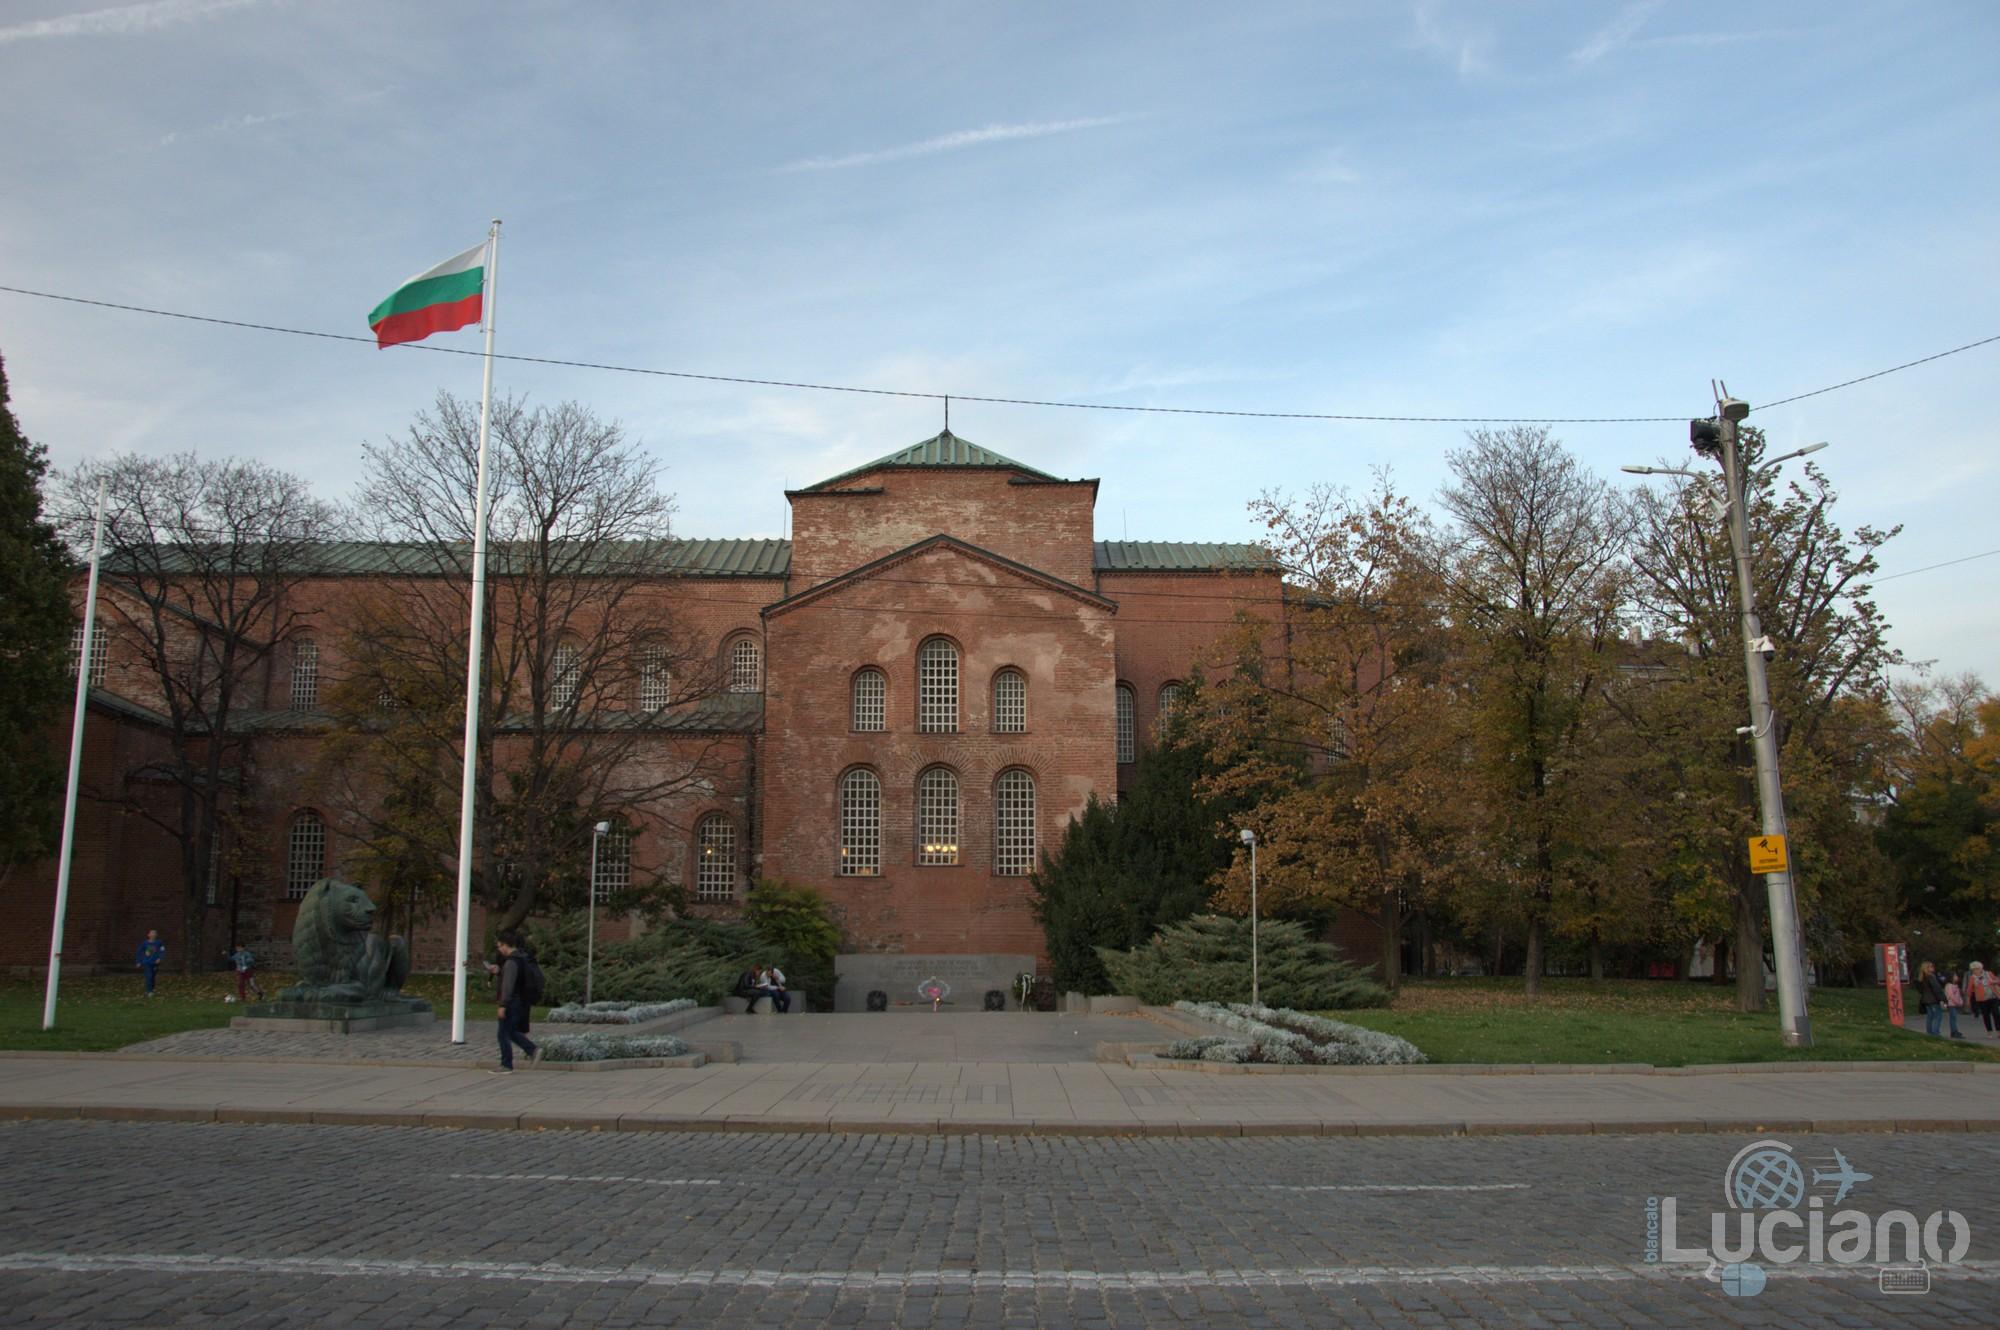 Sofia - Bulgaria - chiesa di Santa Sofia (in bulgaro: Църква Света София)